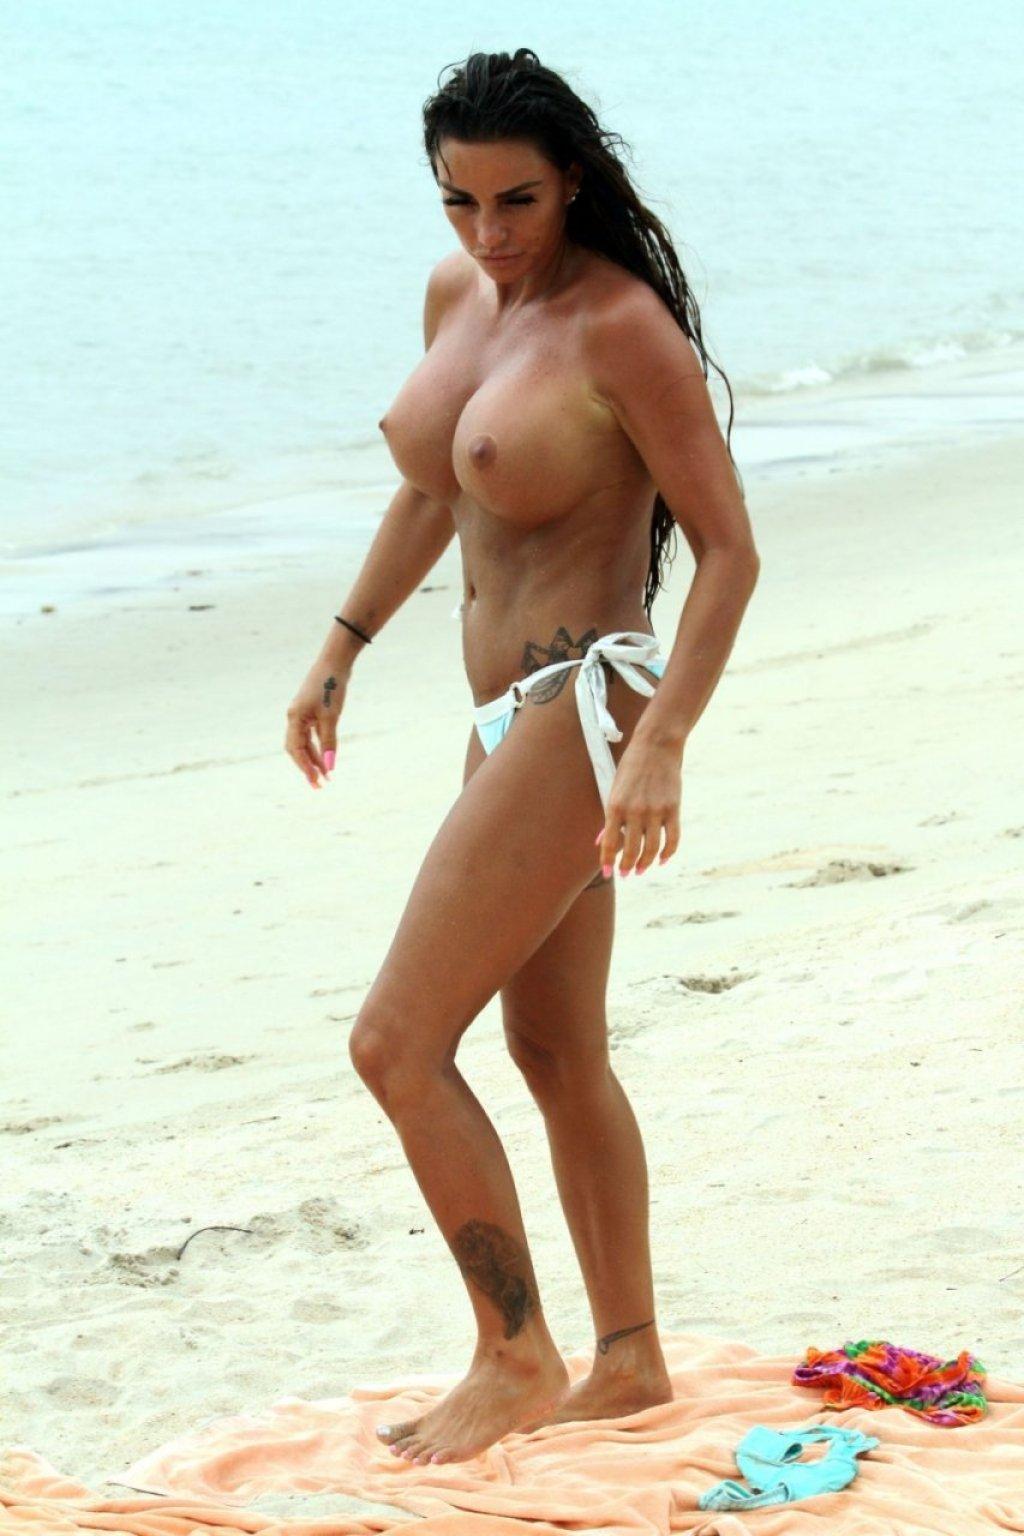 Katie Price Topless (70 Photos)